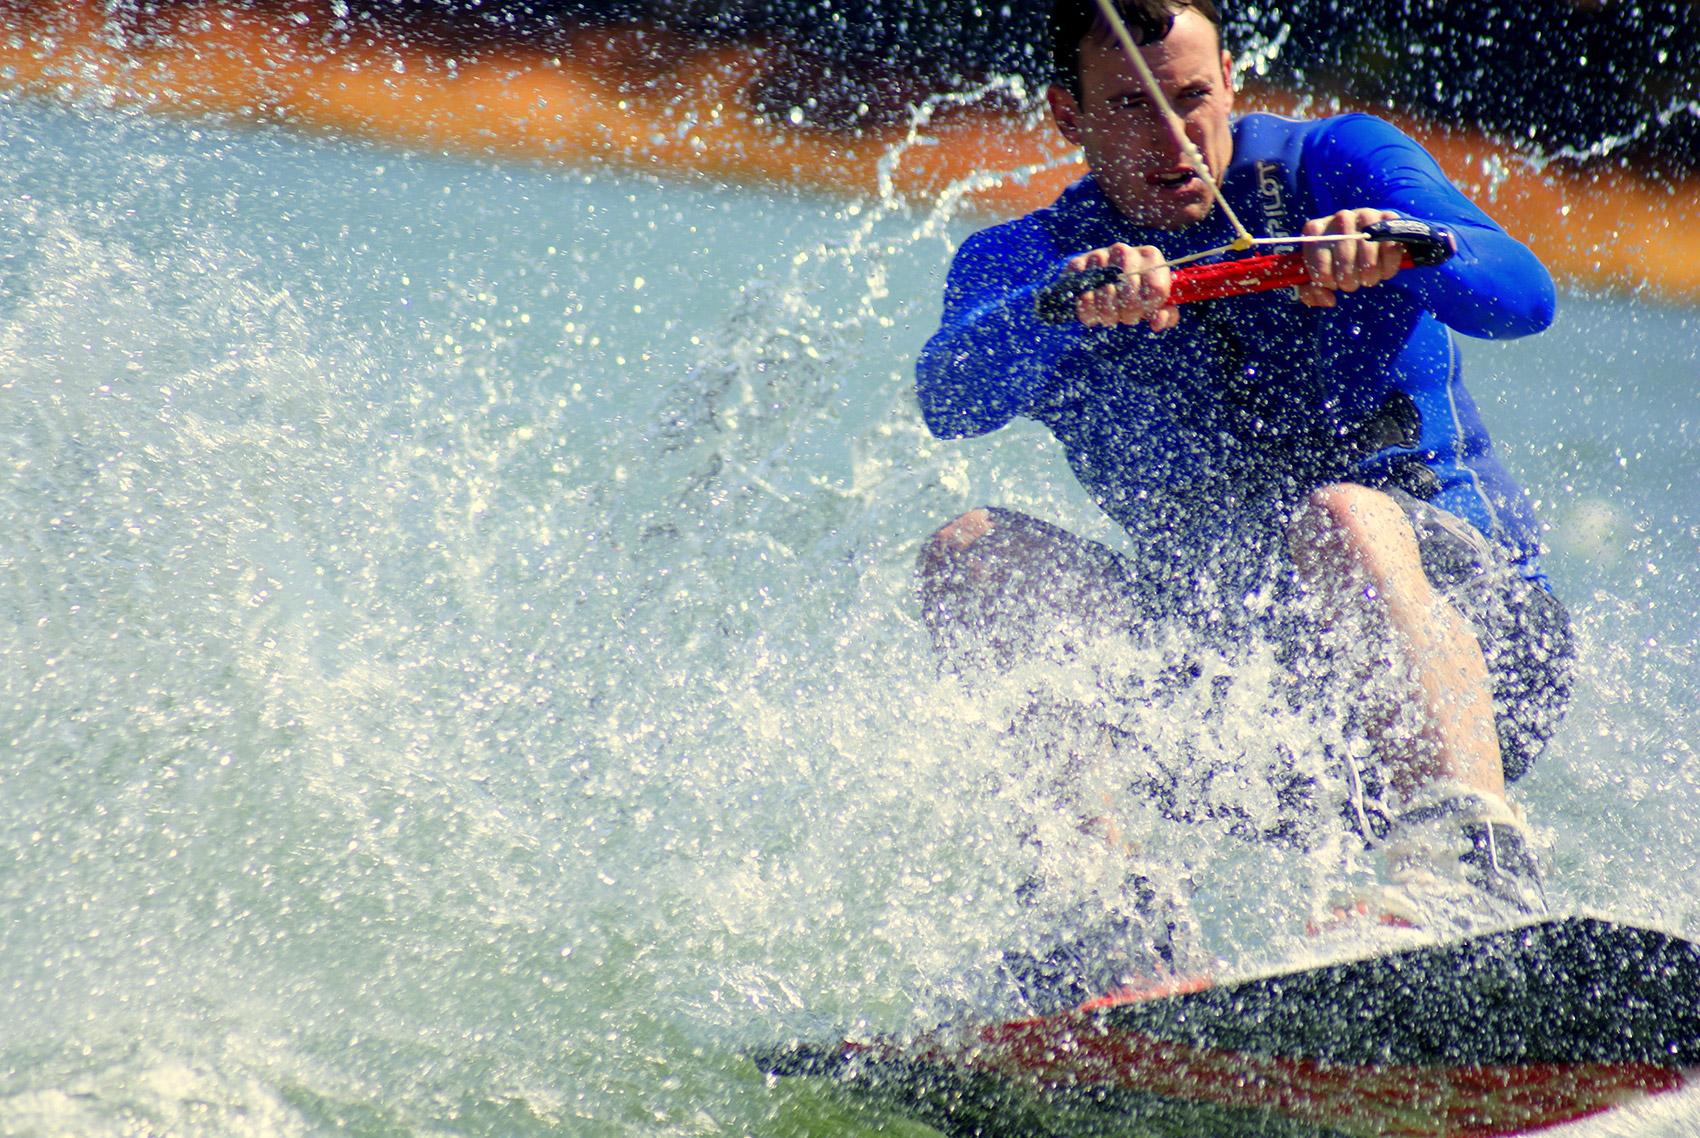 Waroona Dam Wakeboard courtesy Lidia Templeman Twells